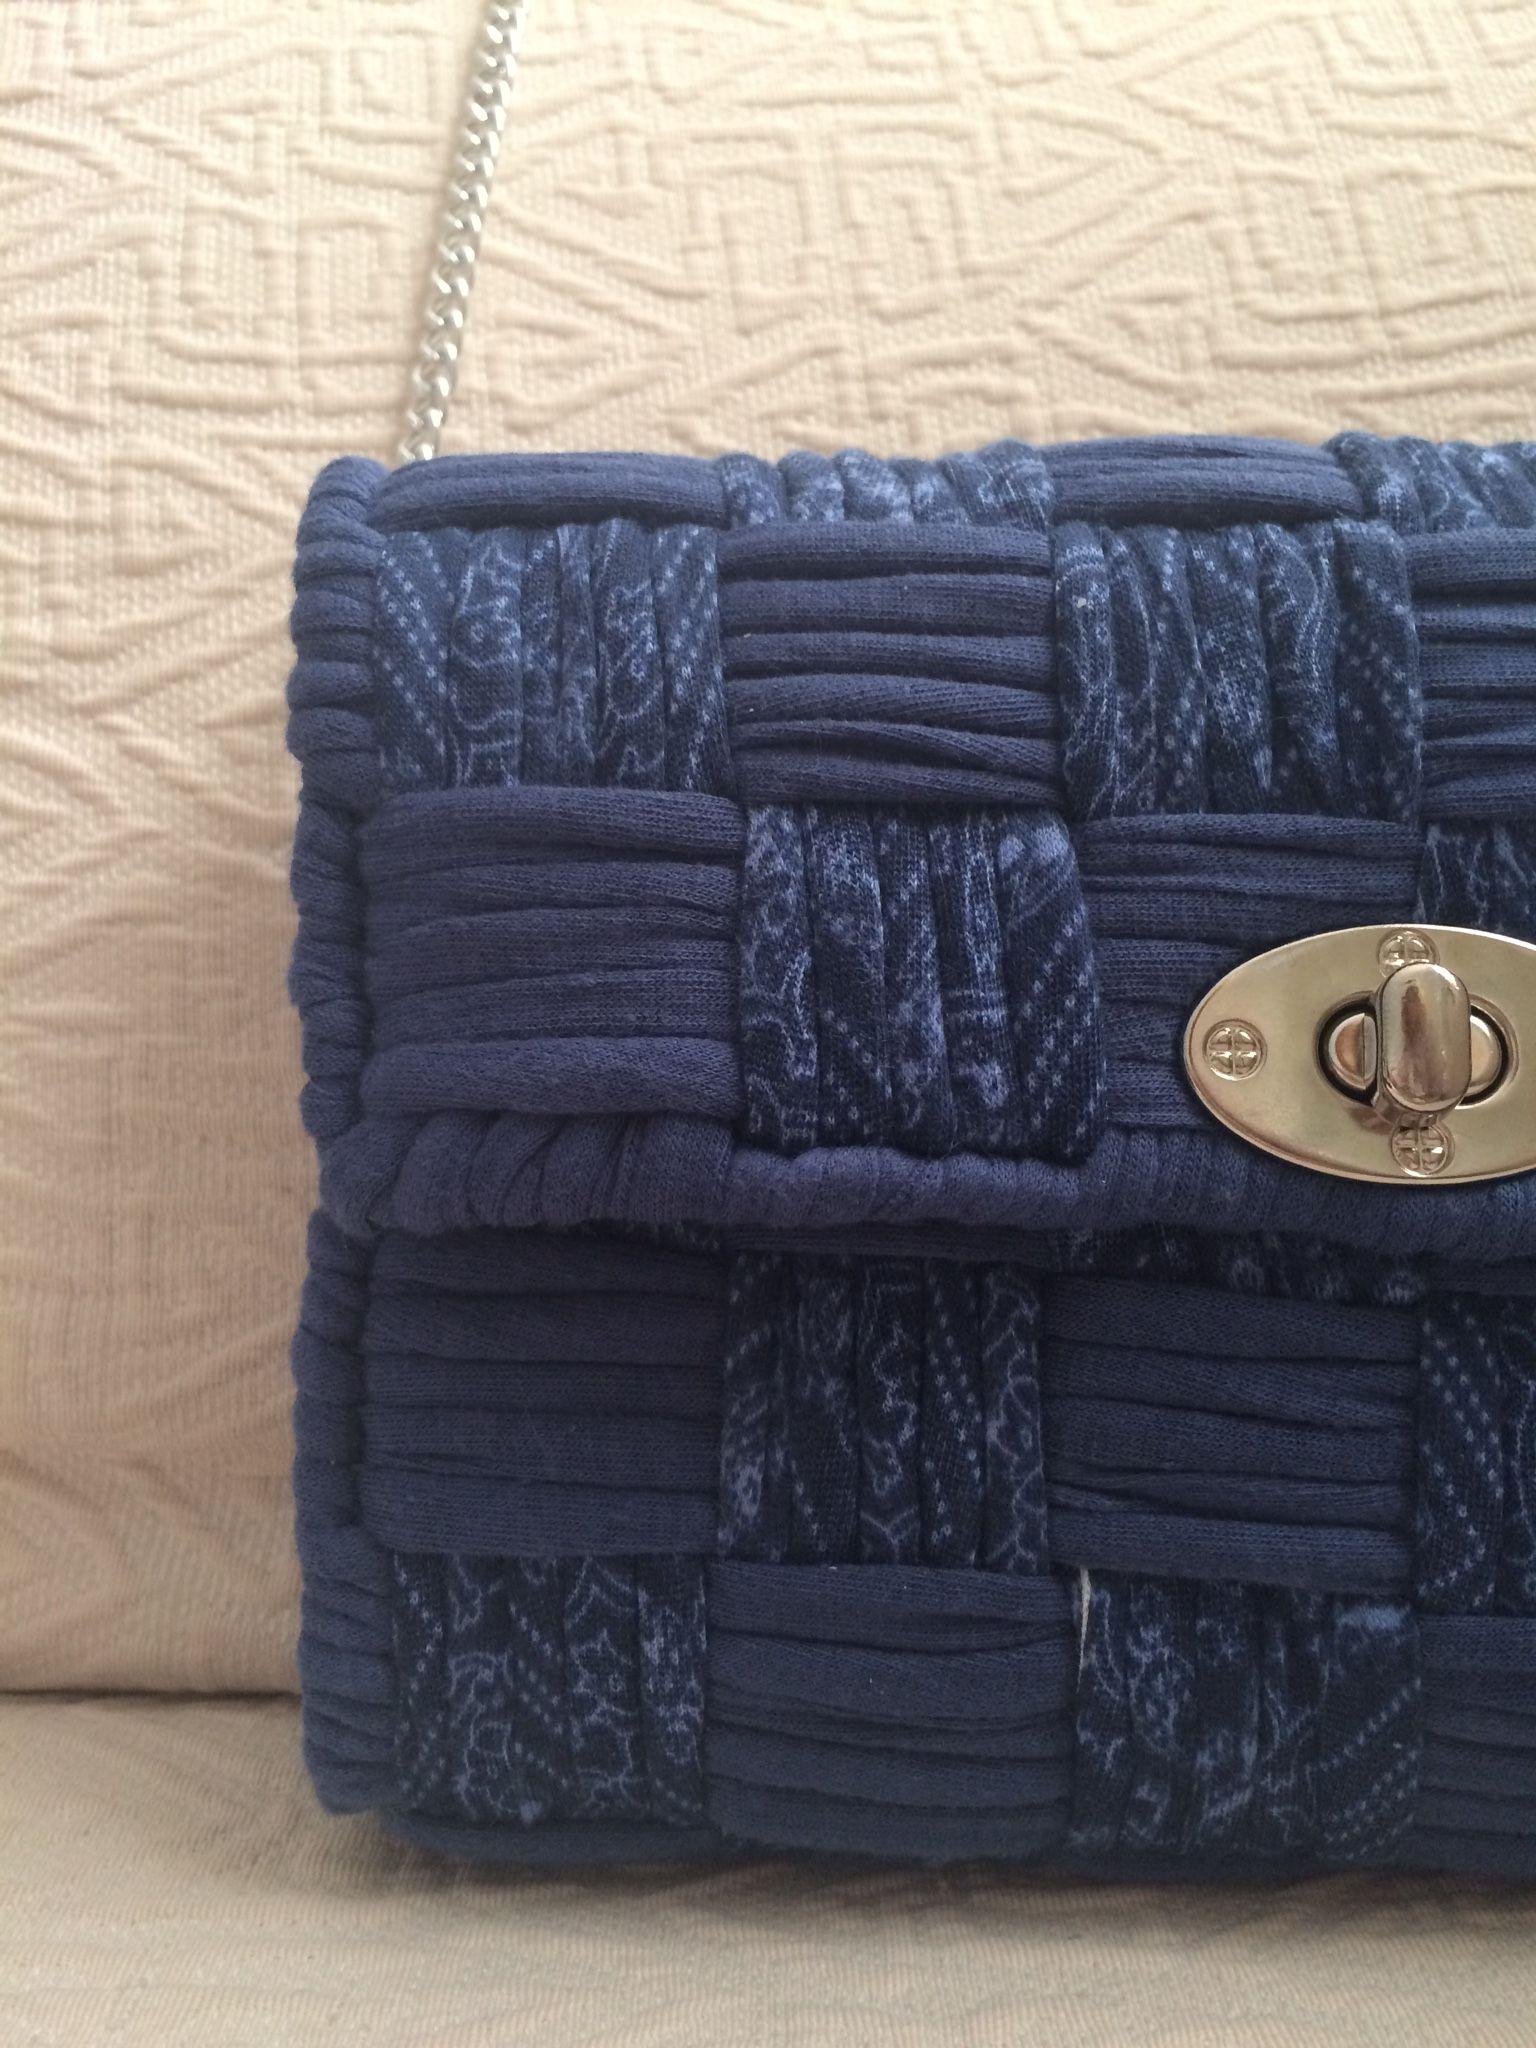 Pin von Pilar GB auf Macadamia Republic   Pinterest   Textilgarn ...